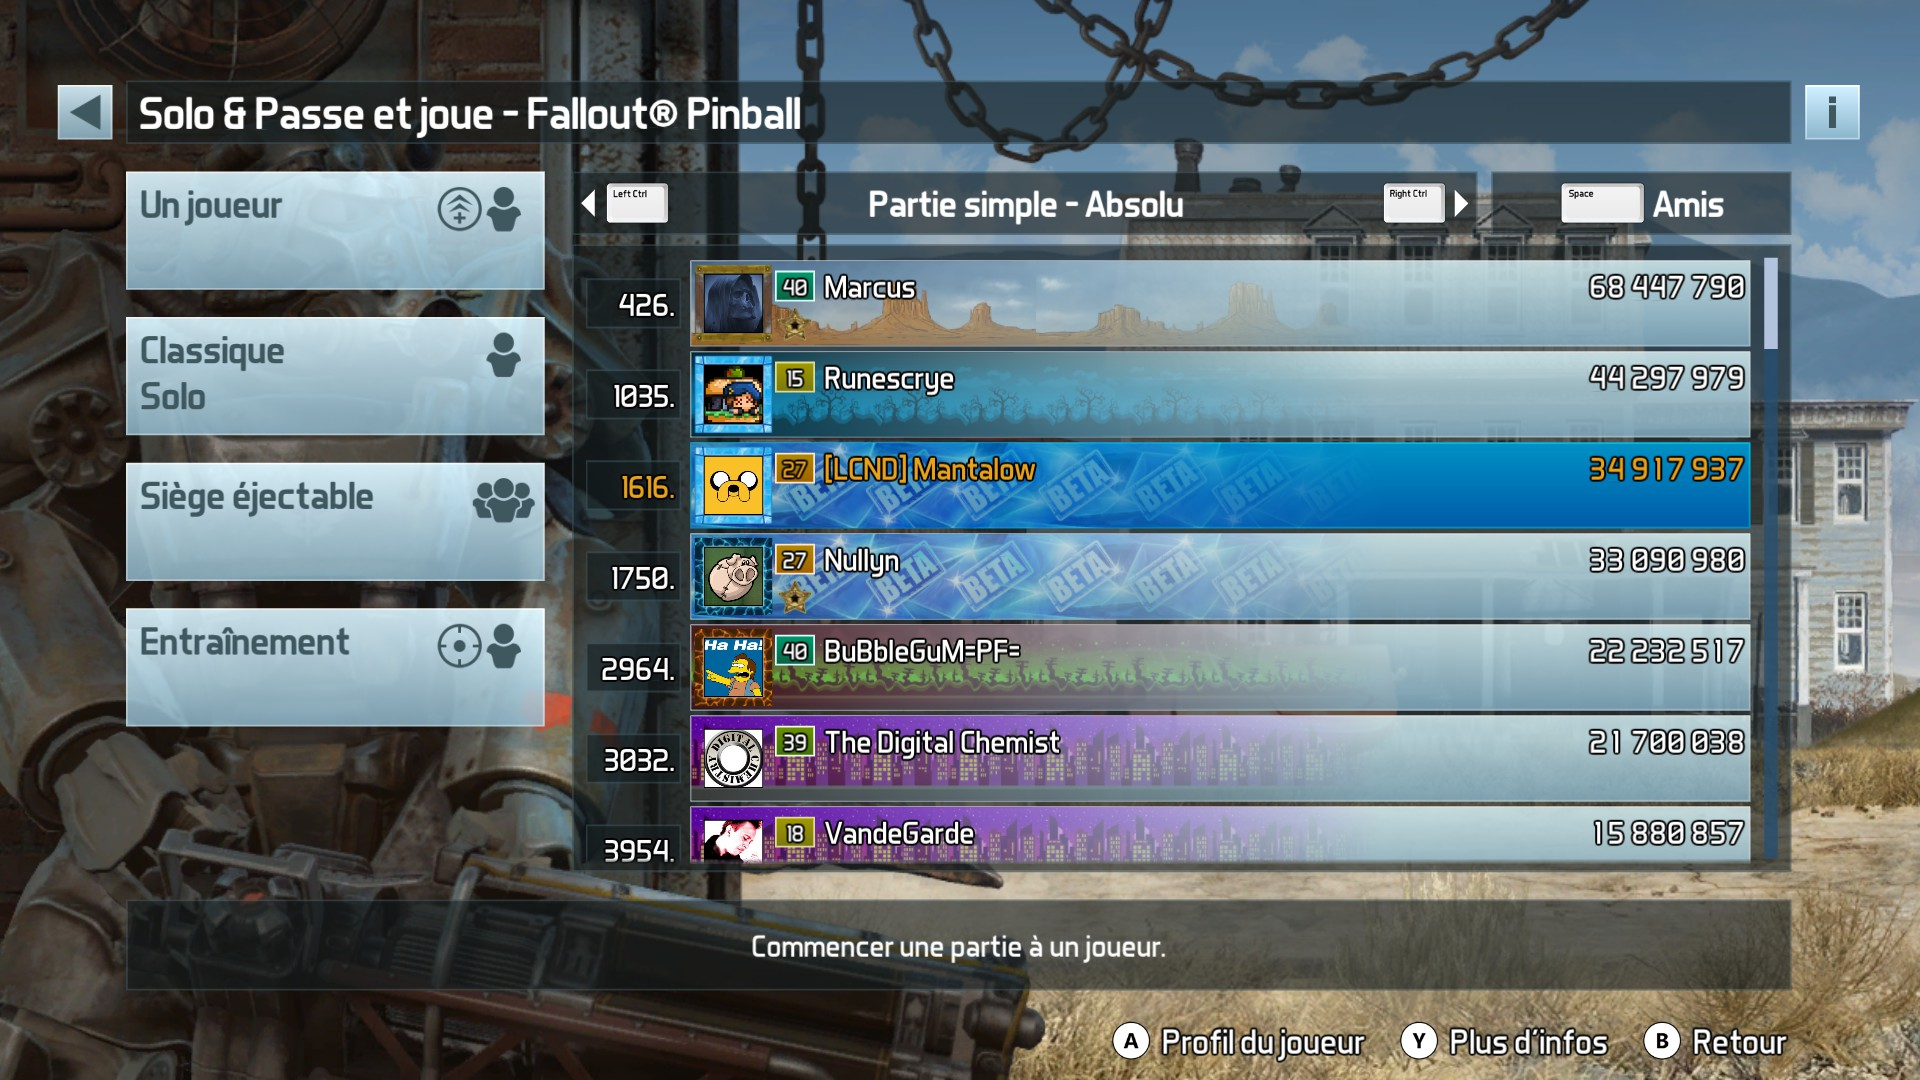 Mantalow: Pinball FX3: Fallout Pinball (PC) 34,917,937 points on 2017-12-19 10:47:25